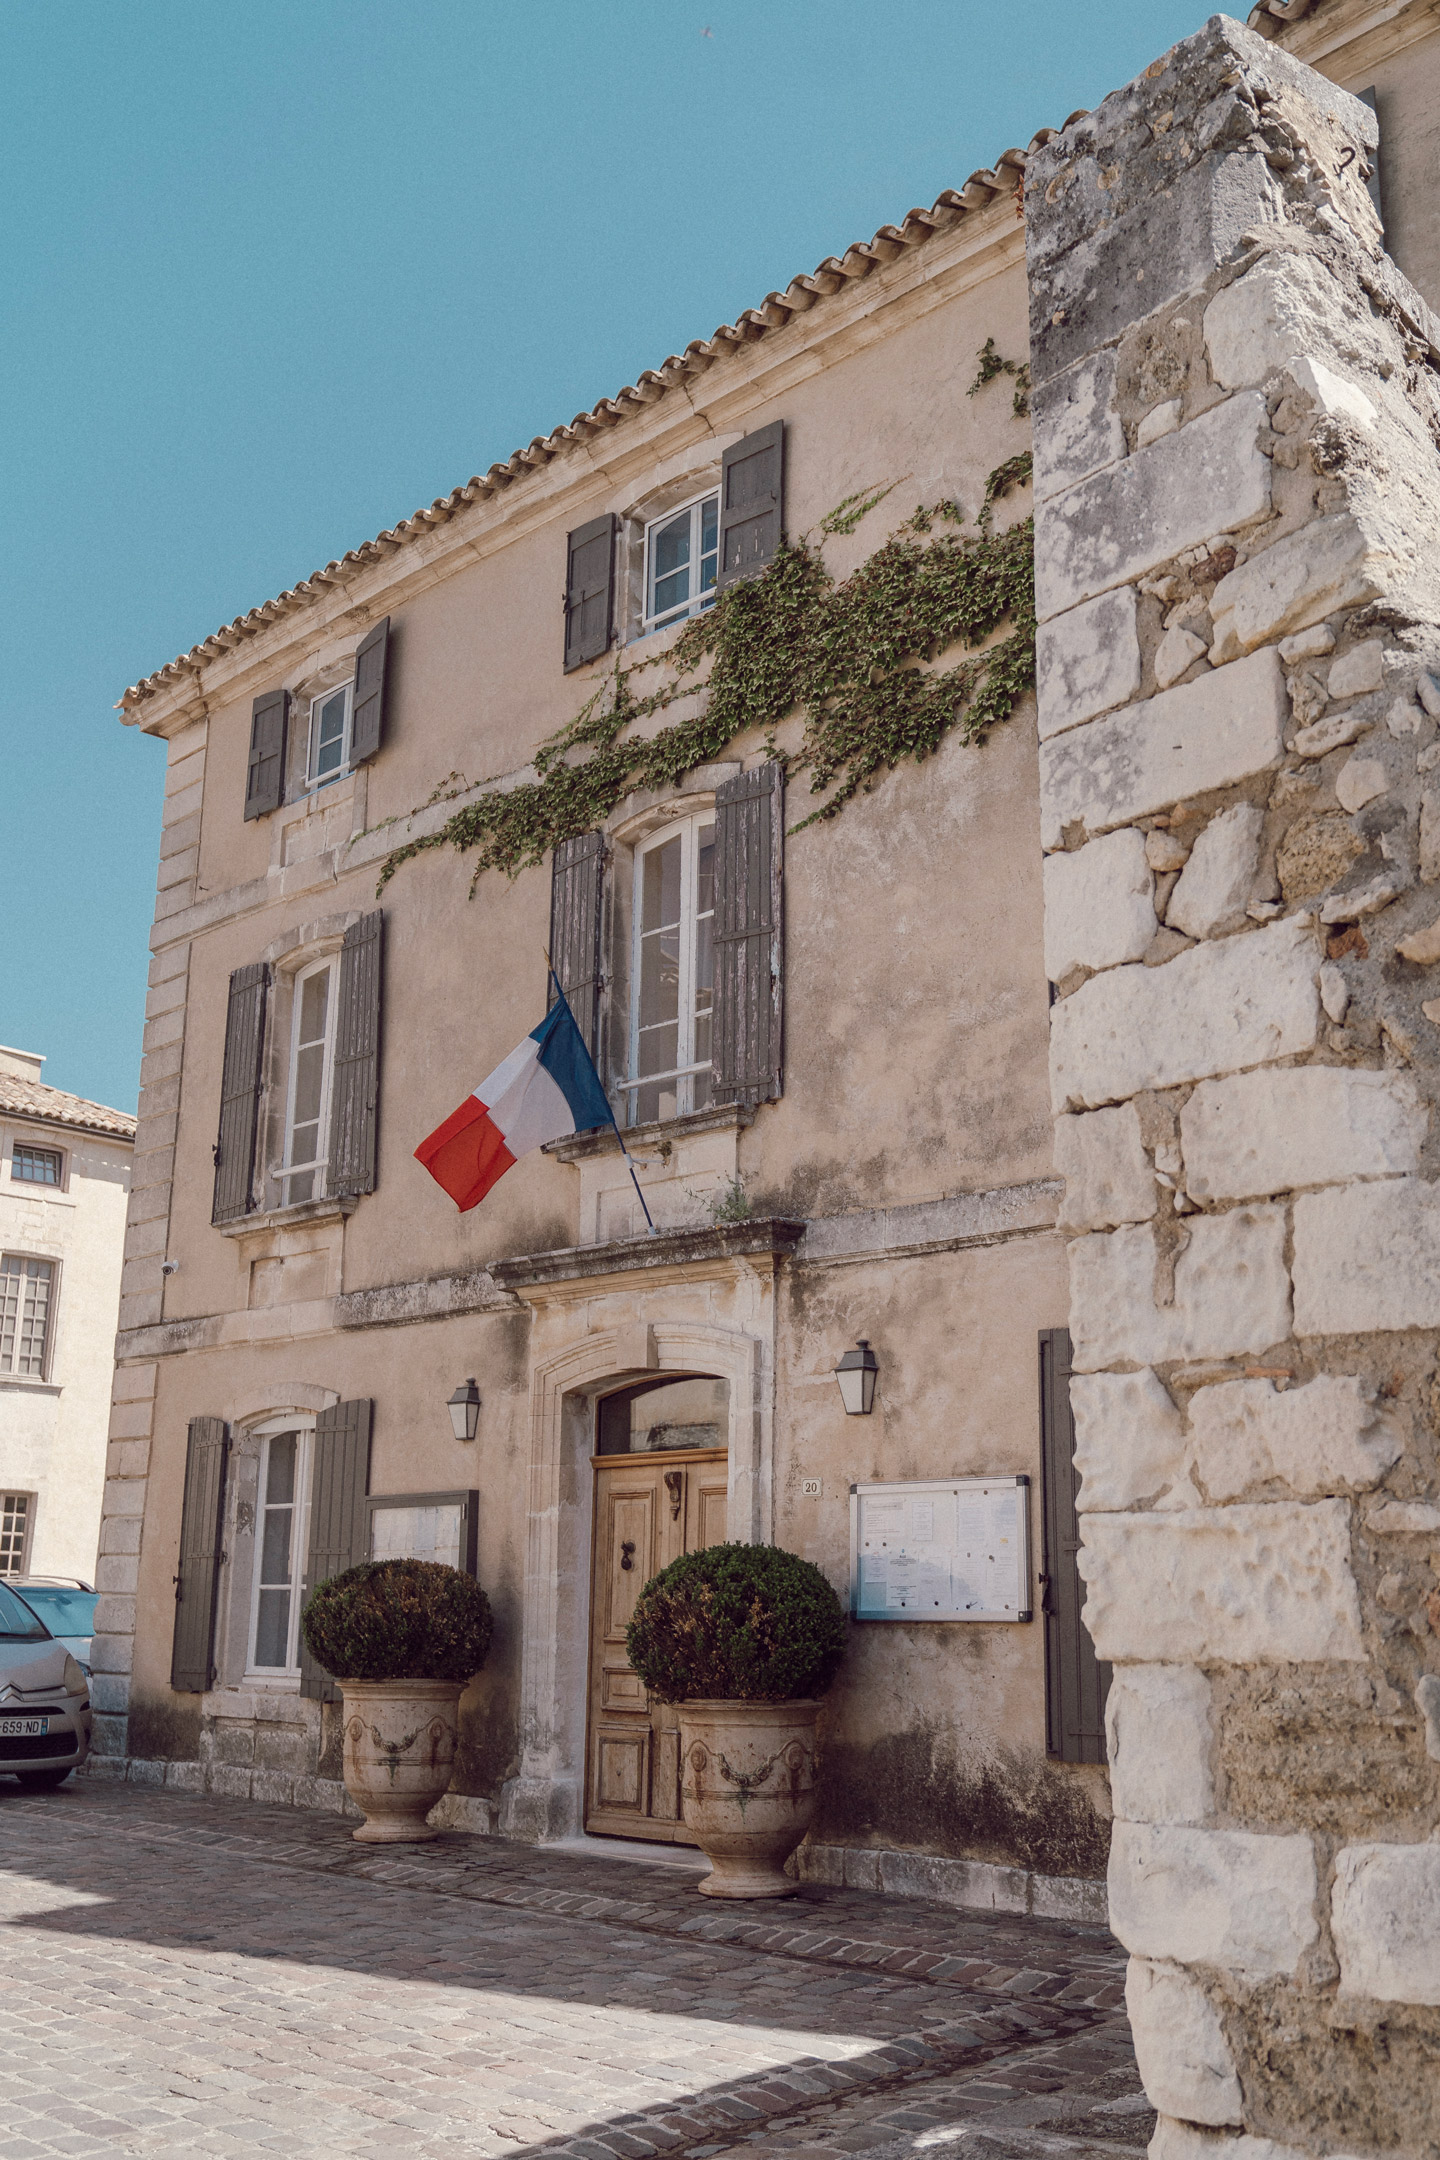 provence-menerbes-oppede-isle-sur-la-sorgue-21